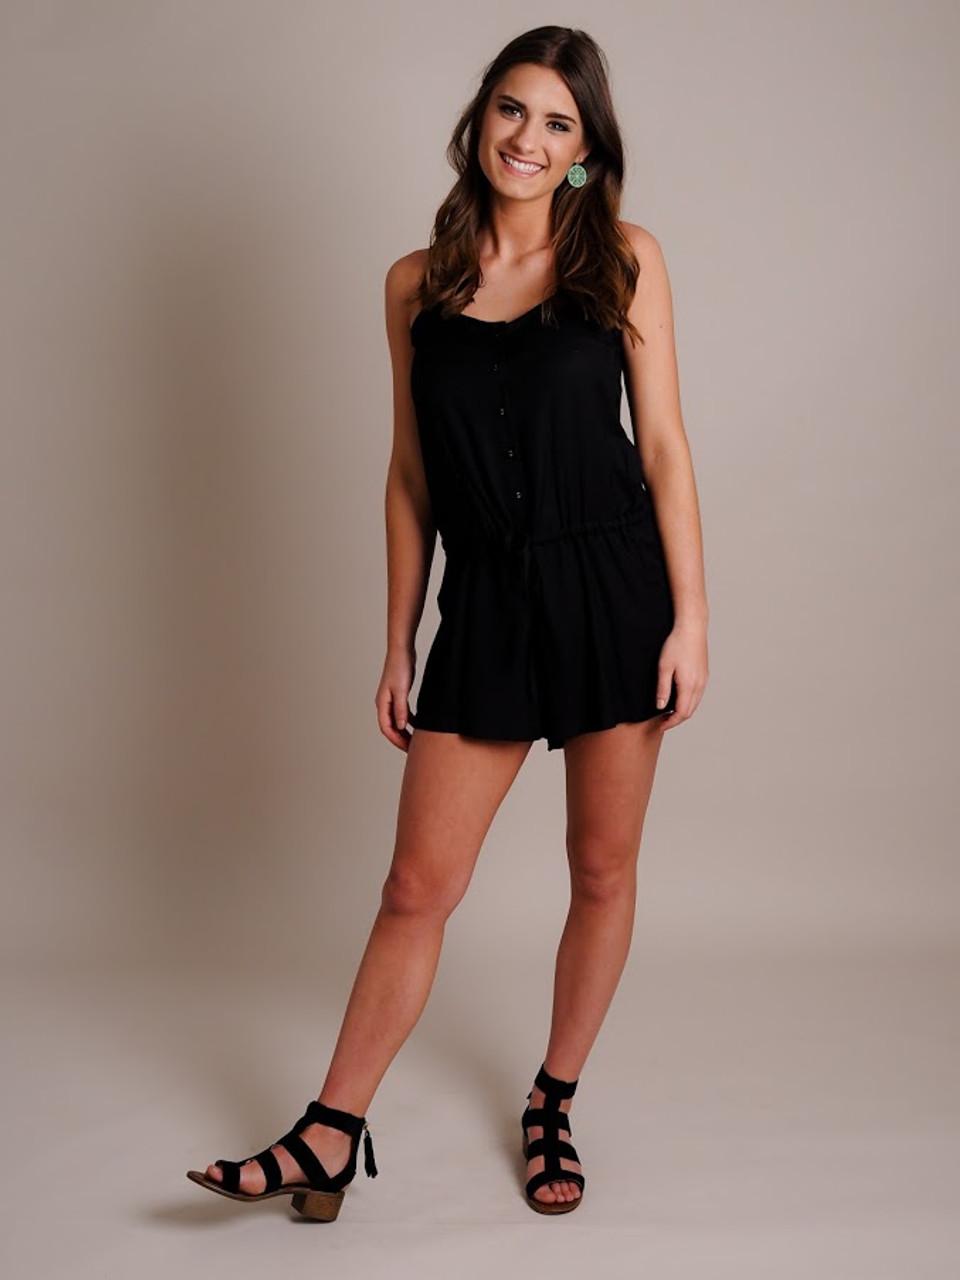 Woman Models Black Cotton Romper